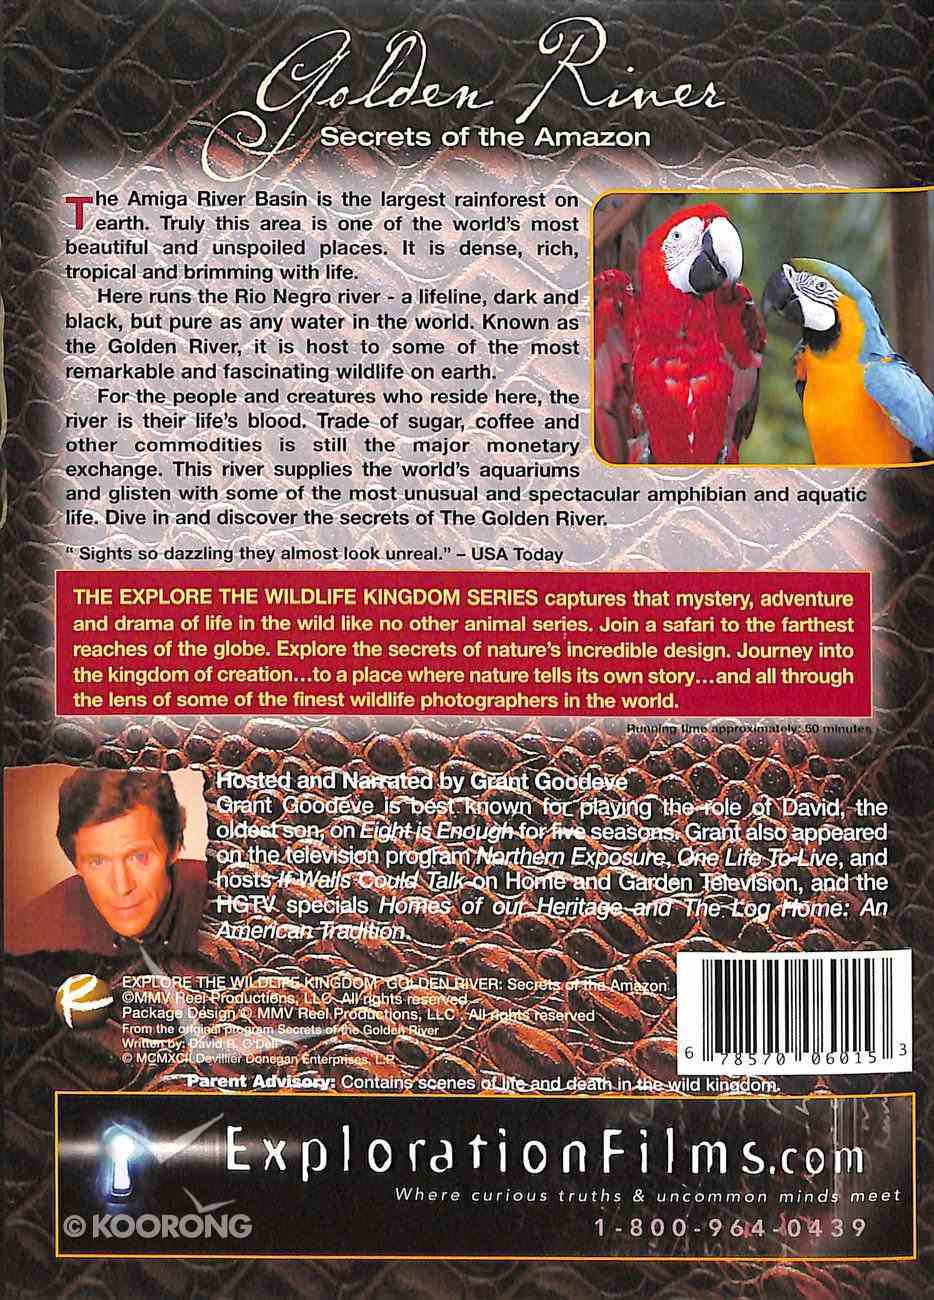 Etwkd: Amazon - Secrets of the Golden River DVD